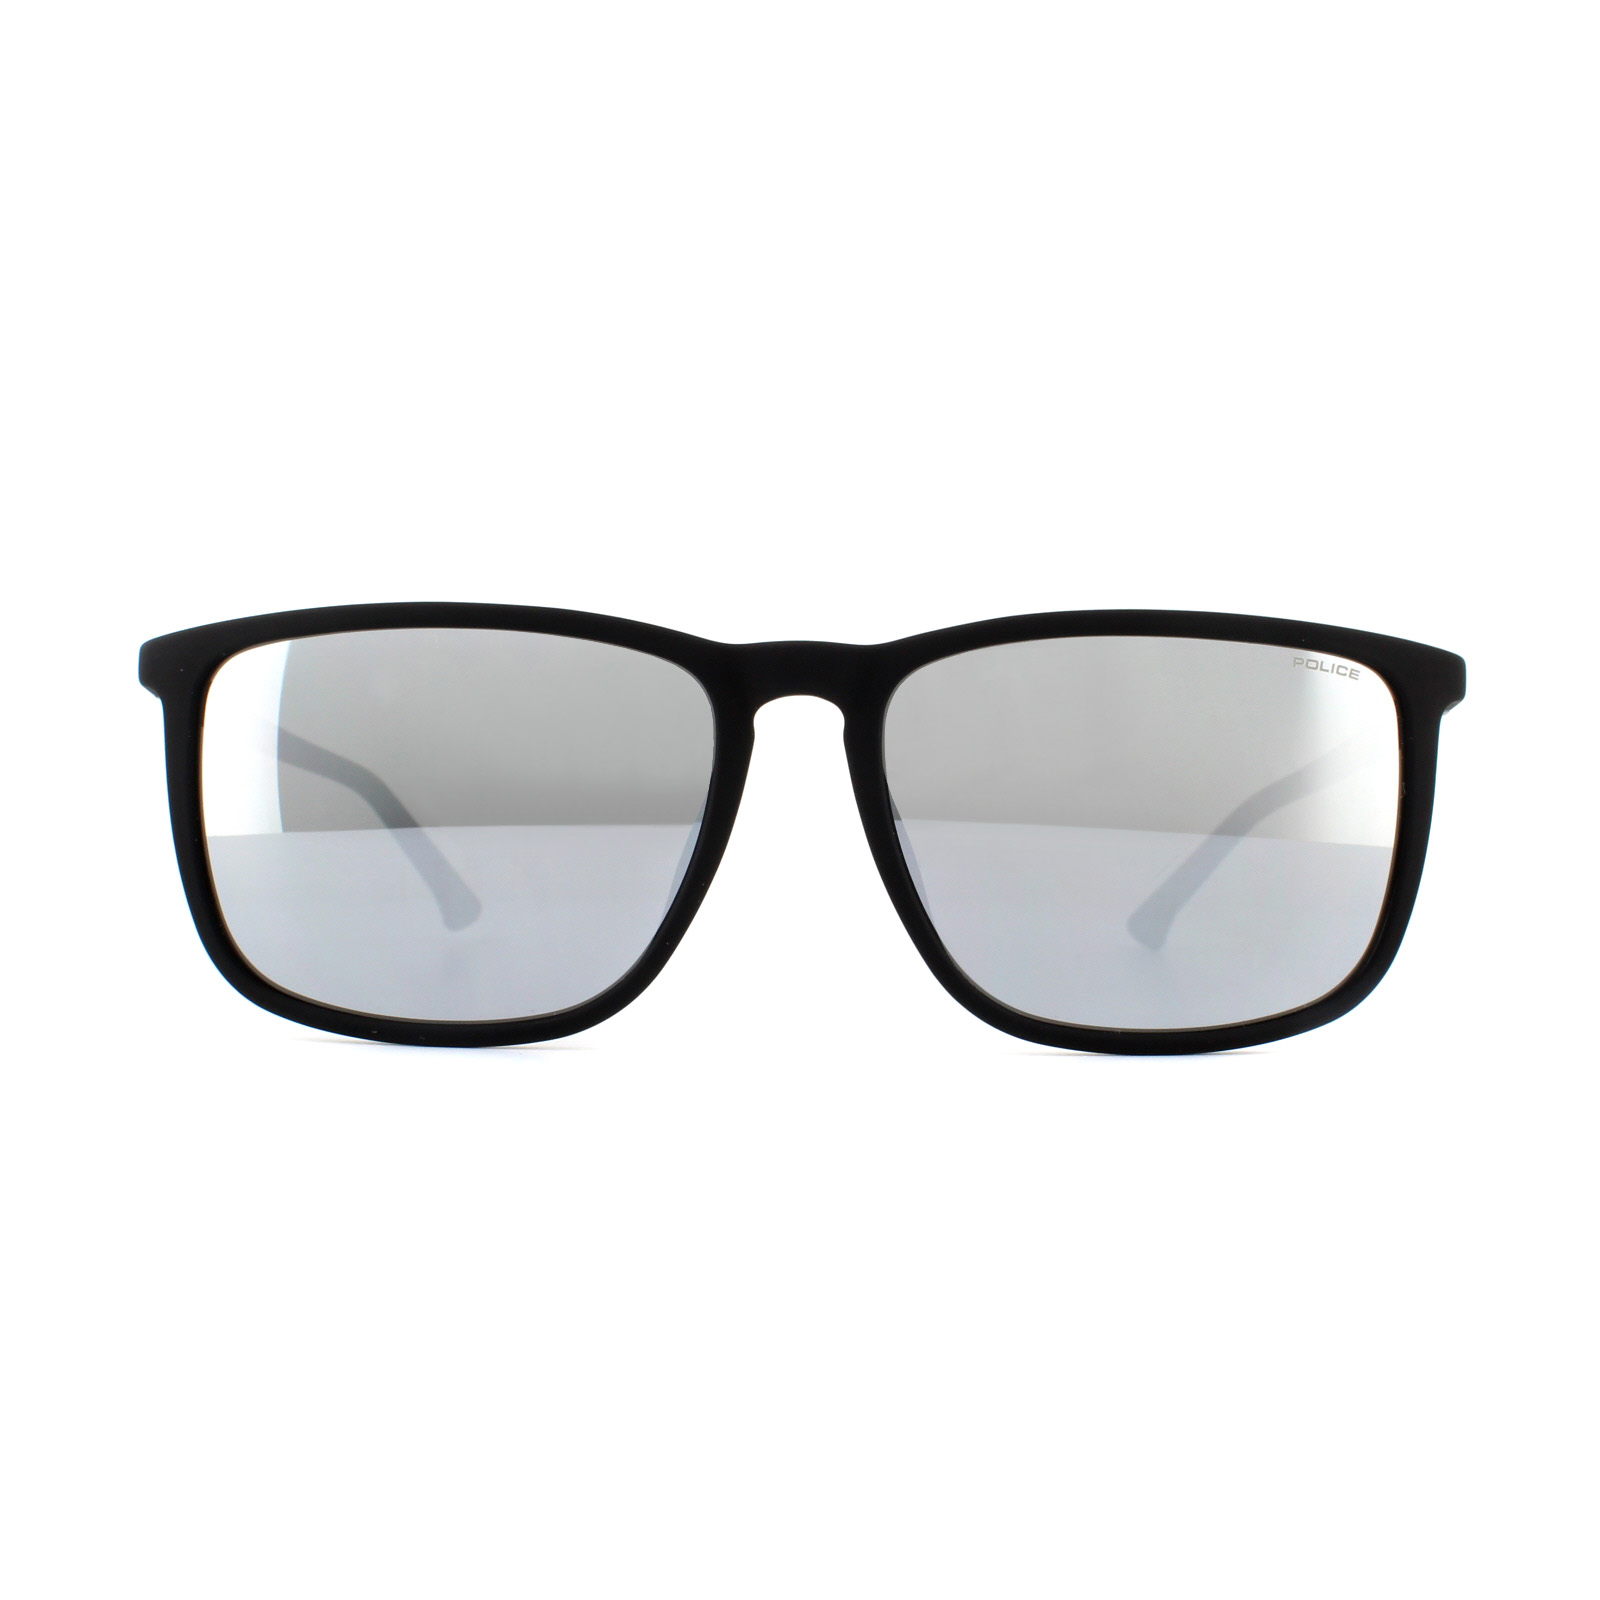 e2b9323b22f Sentinel Thumbnail 2. Sentinel Police Sunglasses SPL342M Jungle 1 6AAX  Rubberized Black Blue Silver Mirror